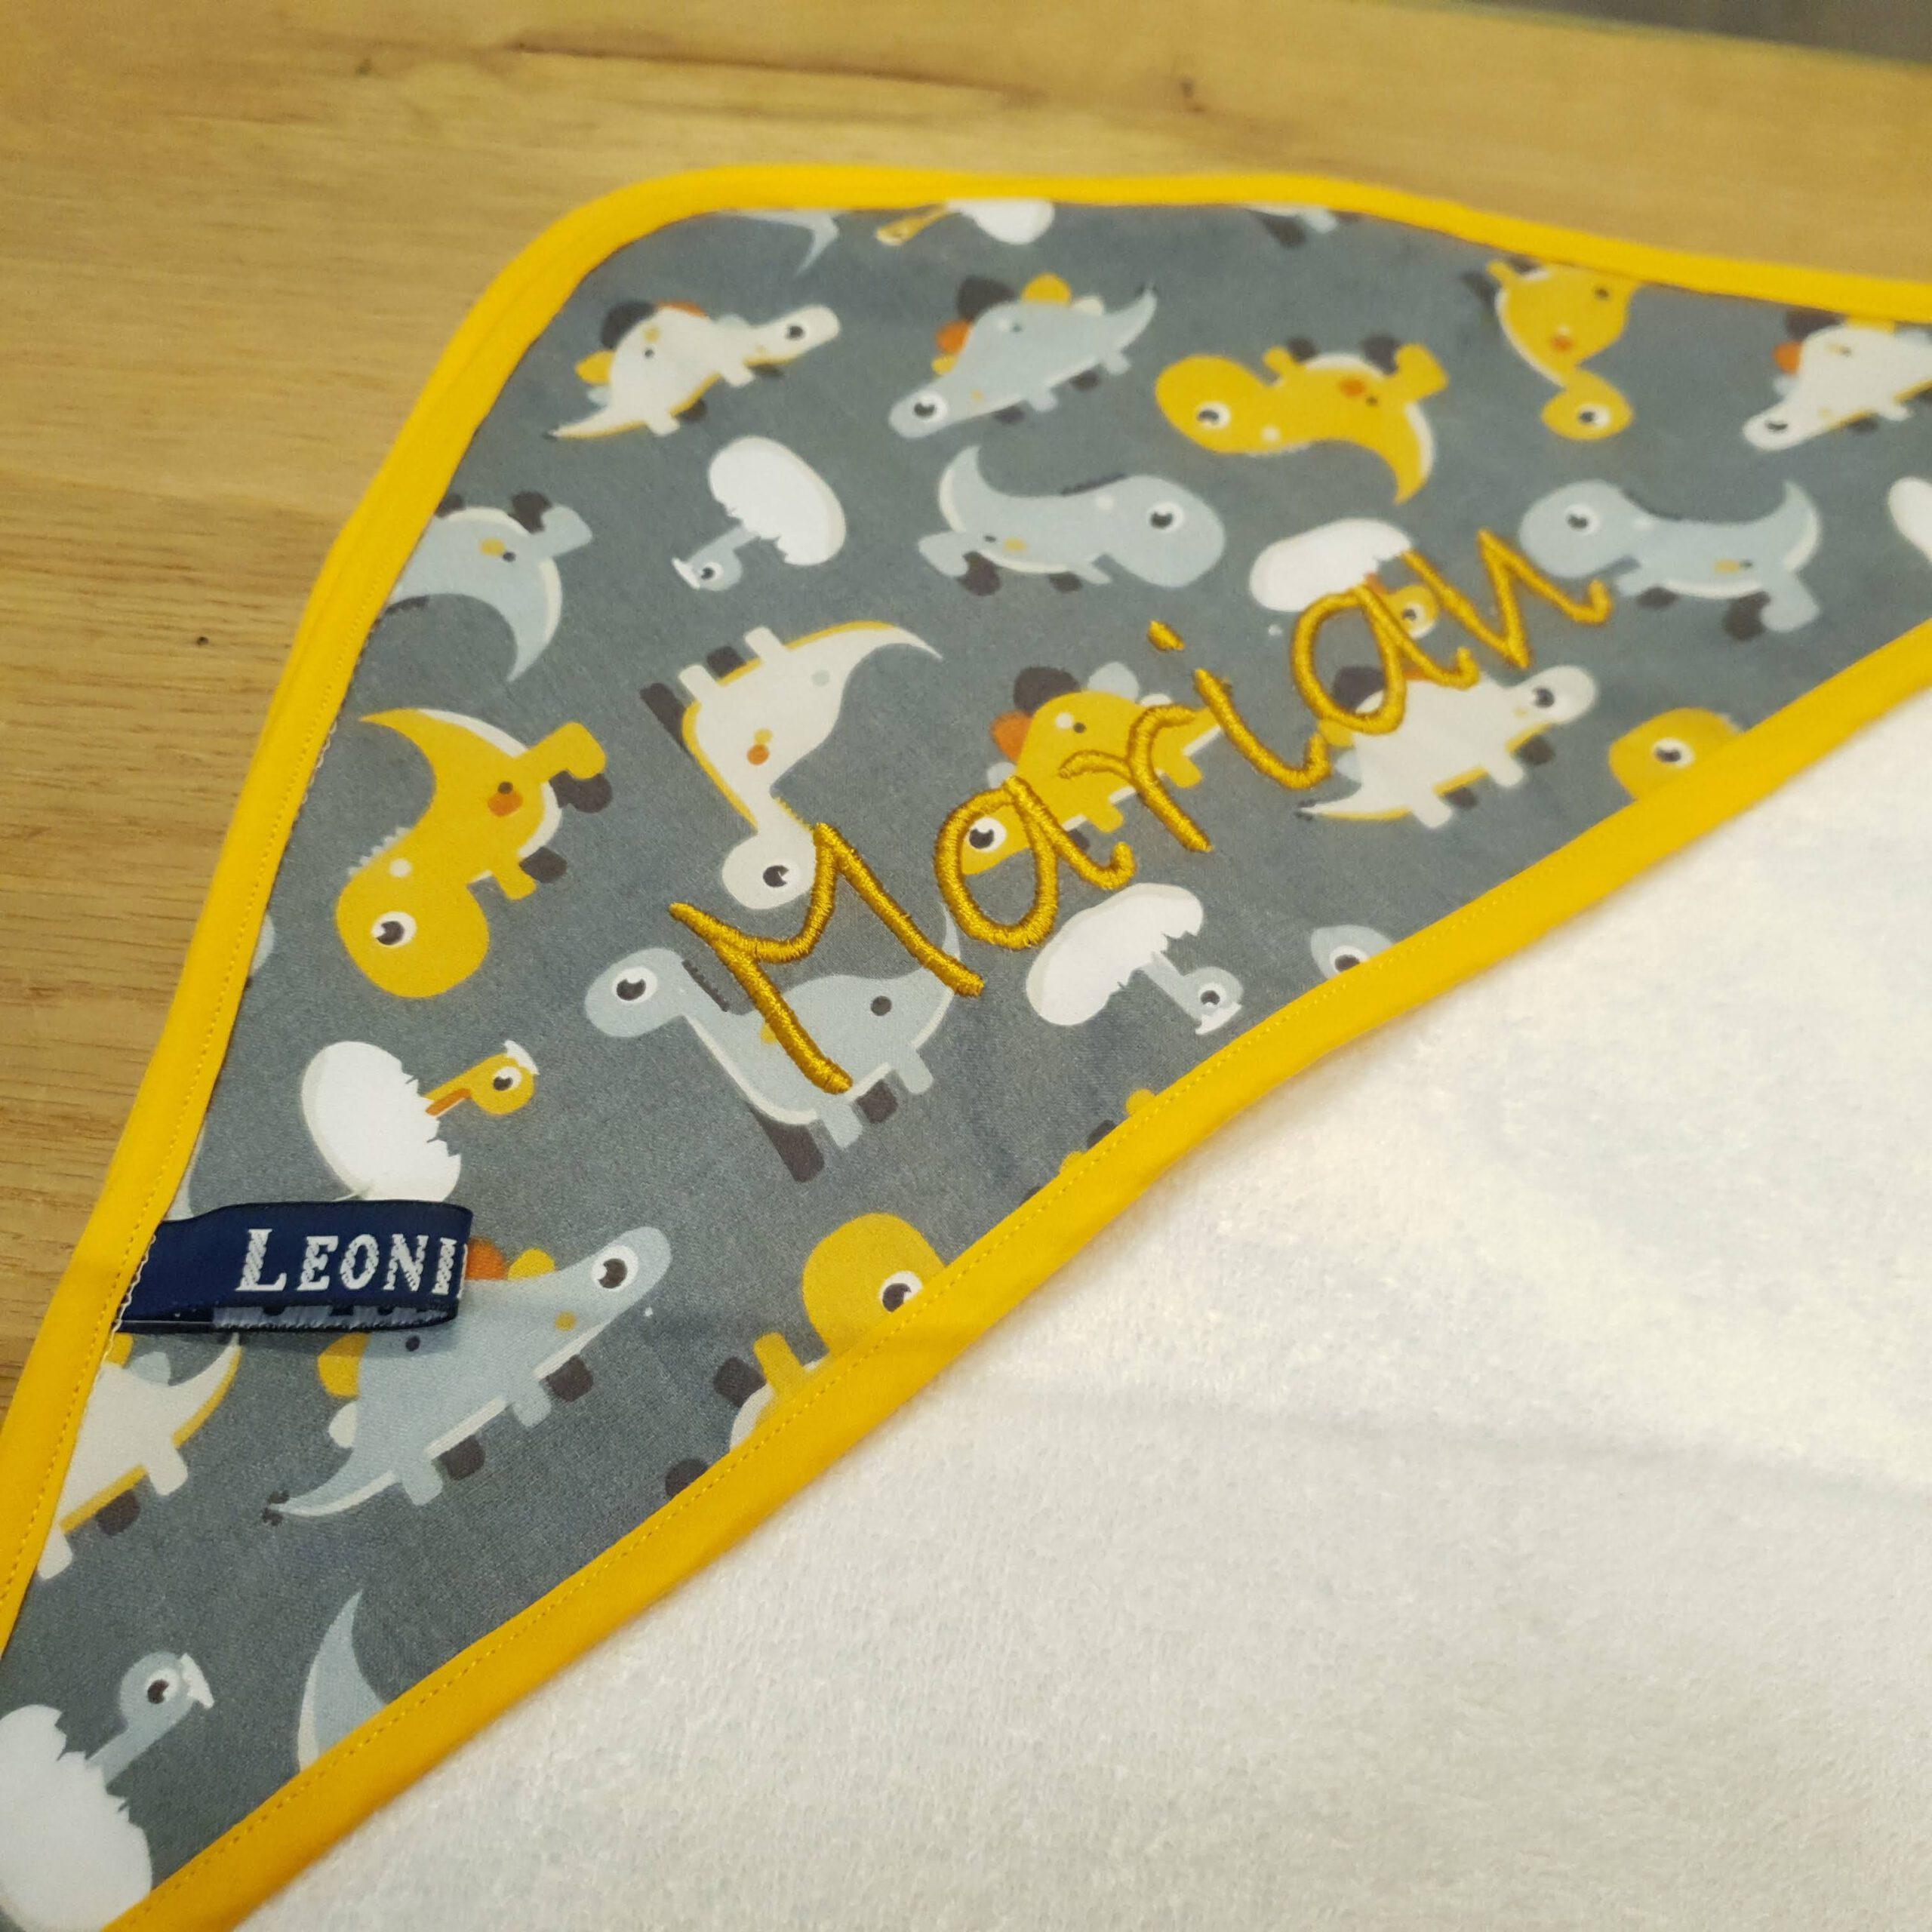 badcape met naam leonietje's